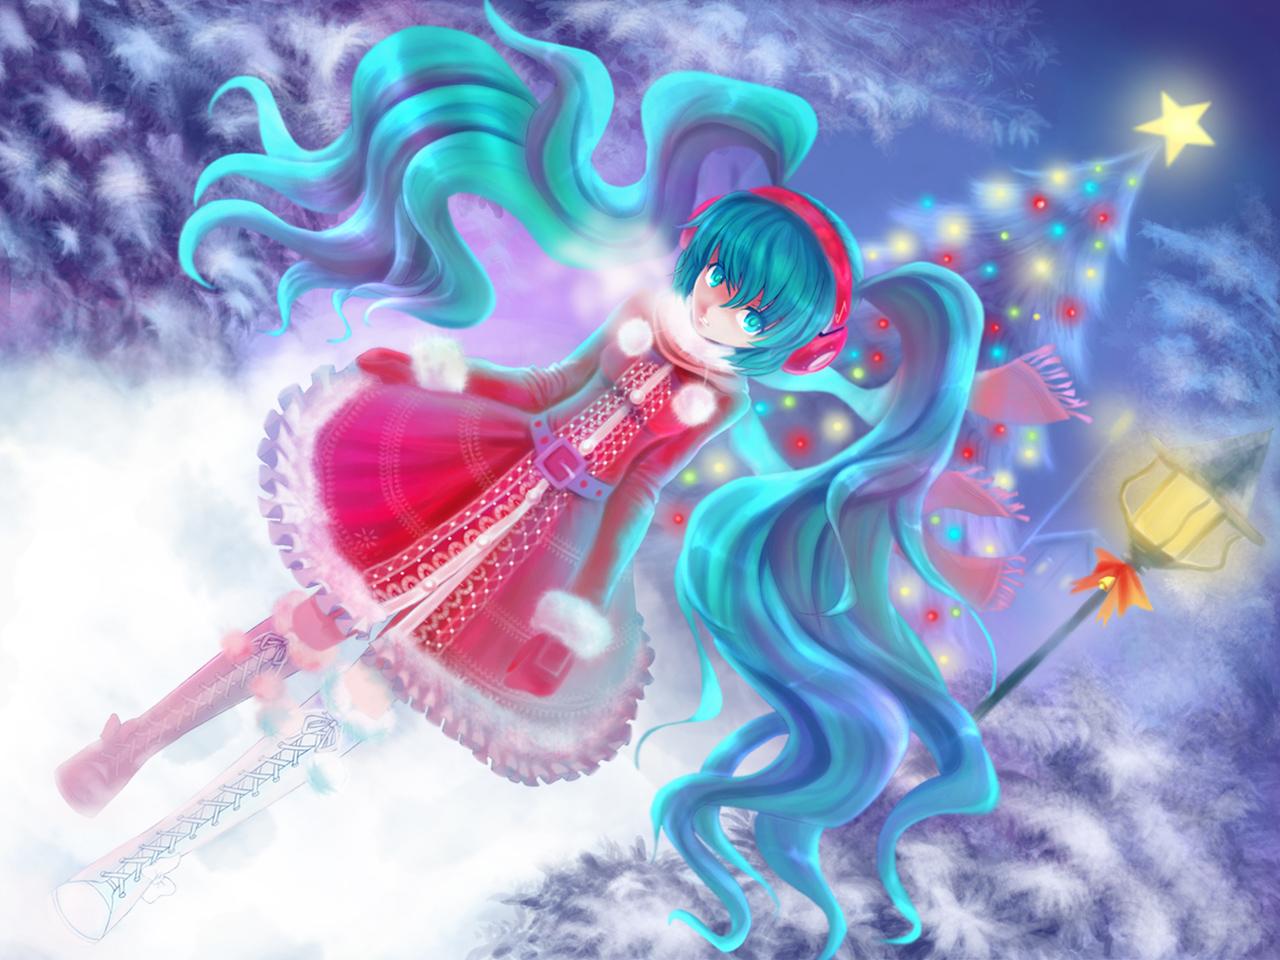 hatsune miku christmas wallpaper - photo #17